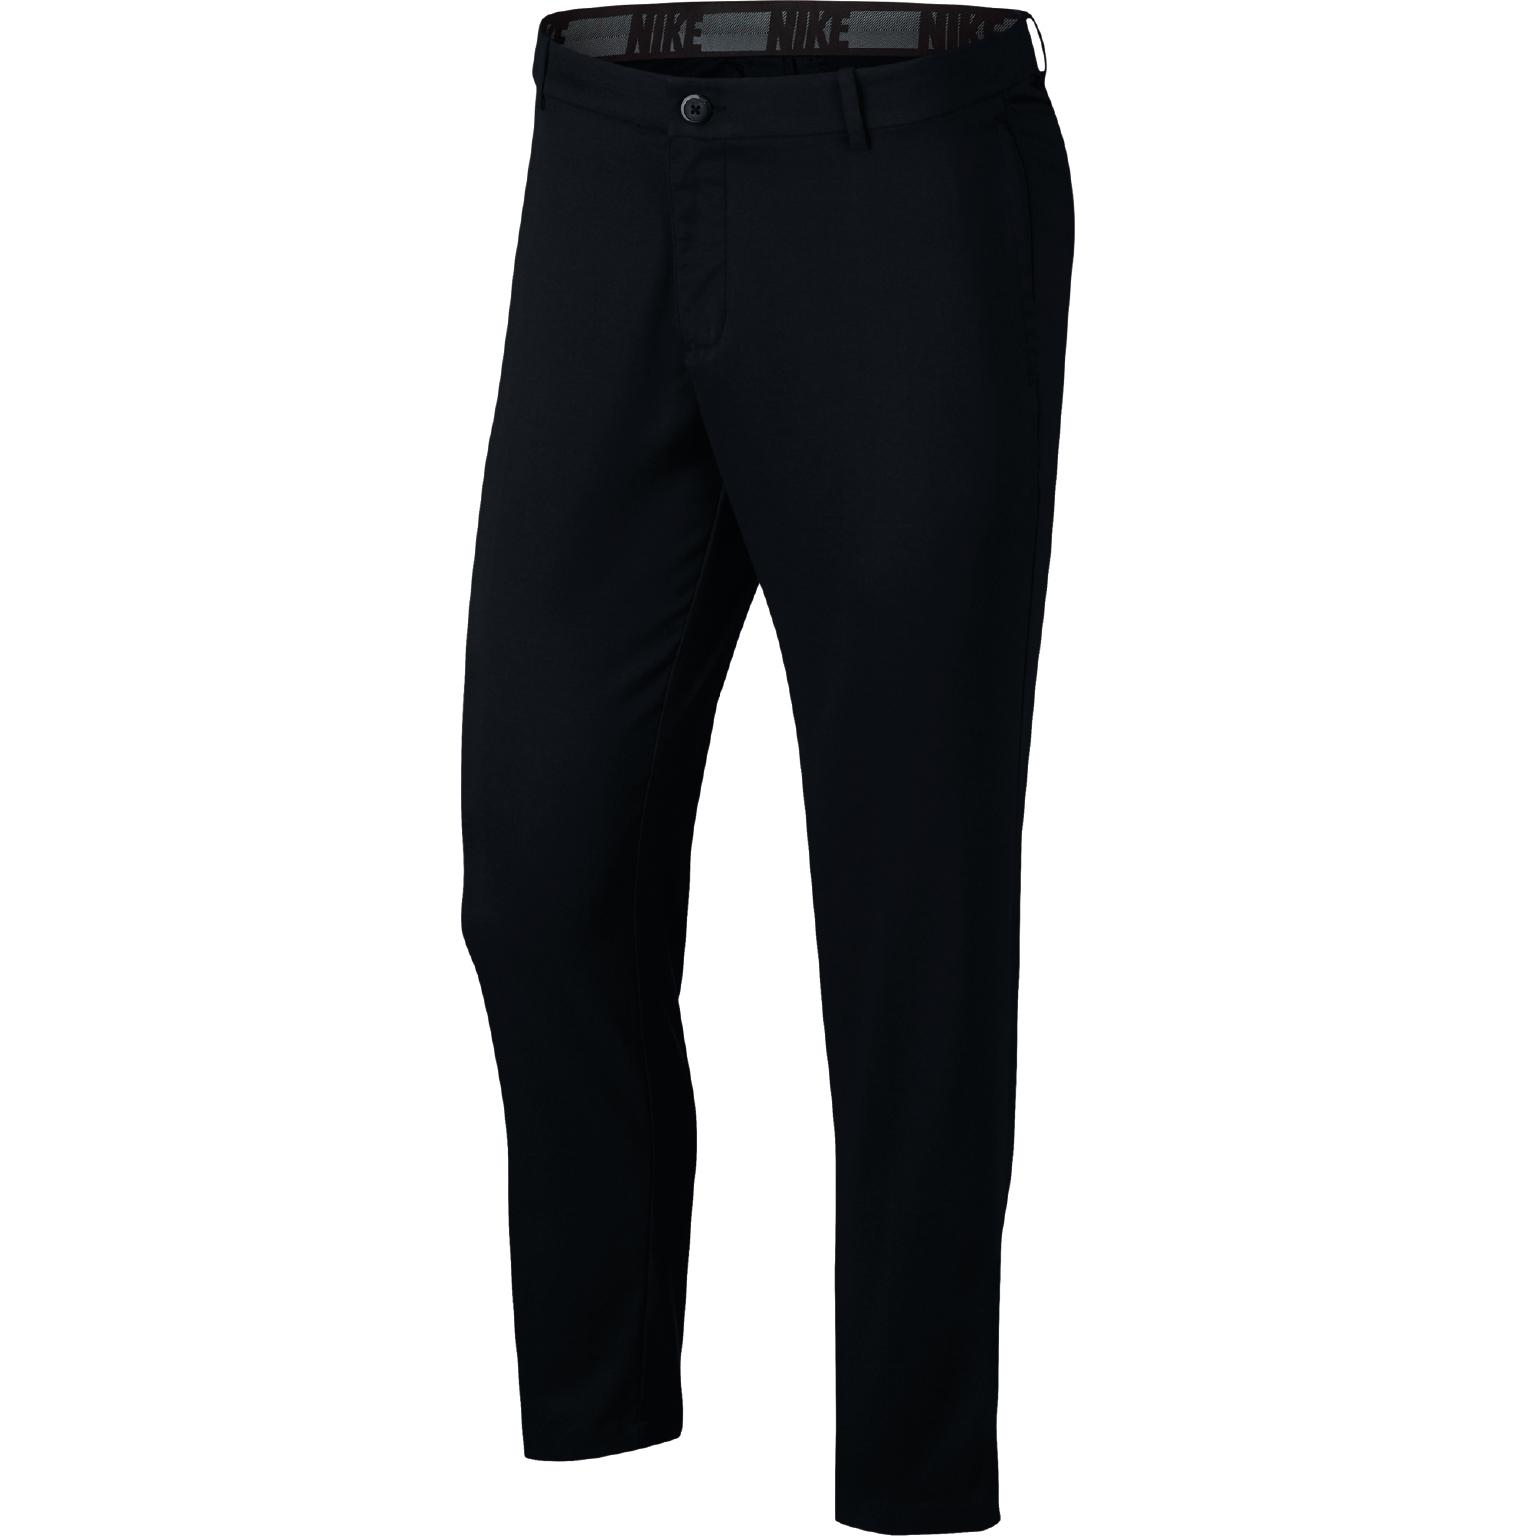 Nike Mens Flex Core Trousers (30R) (Black/Black)